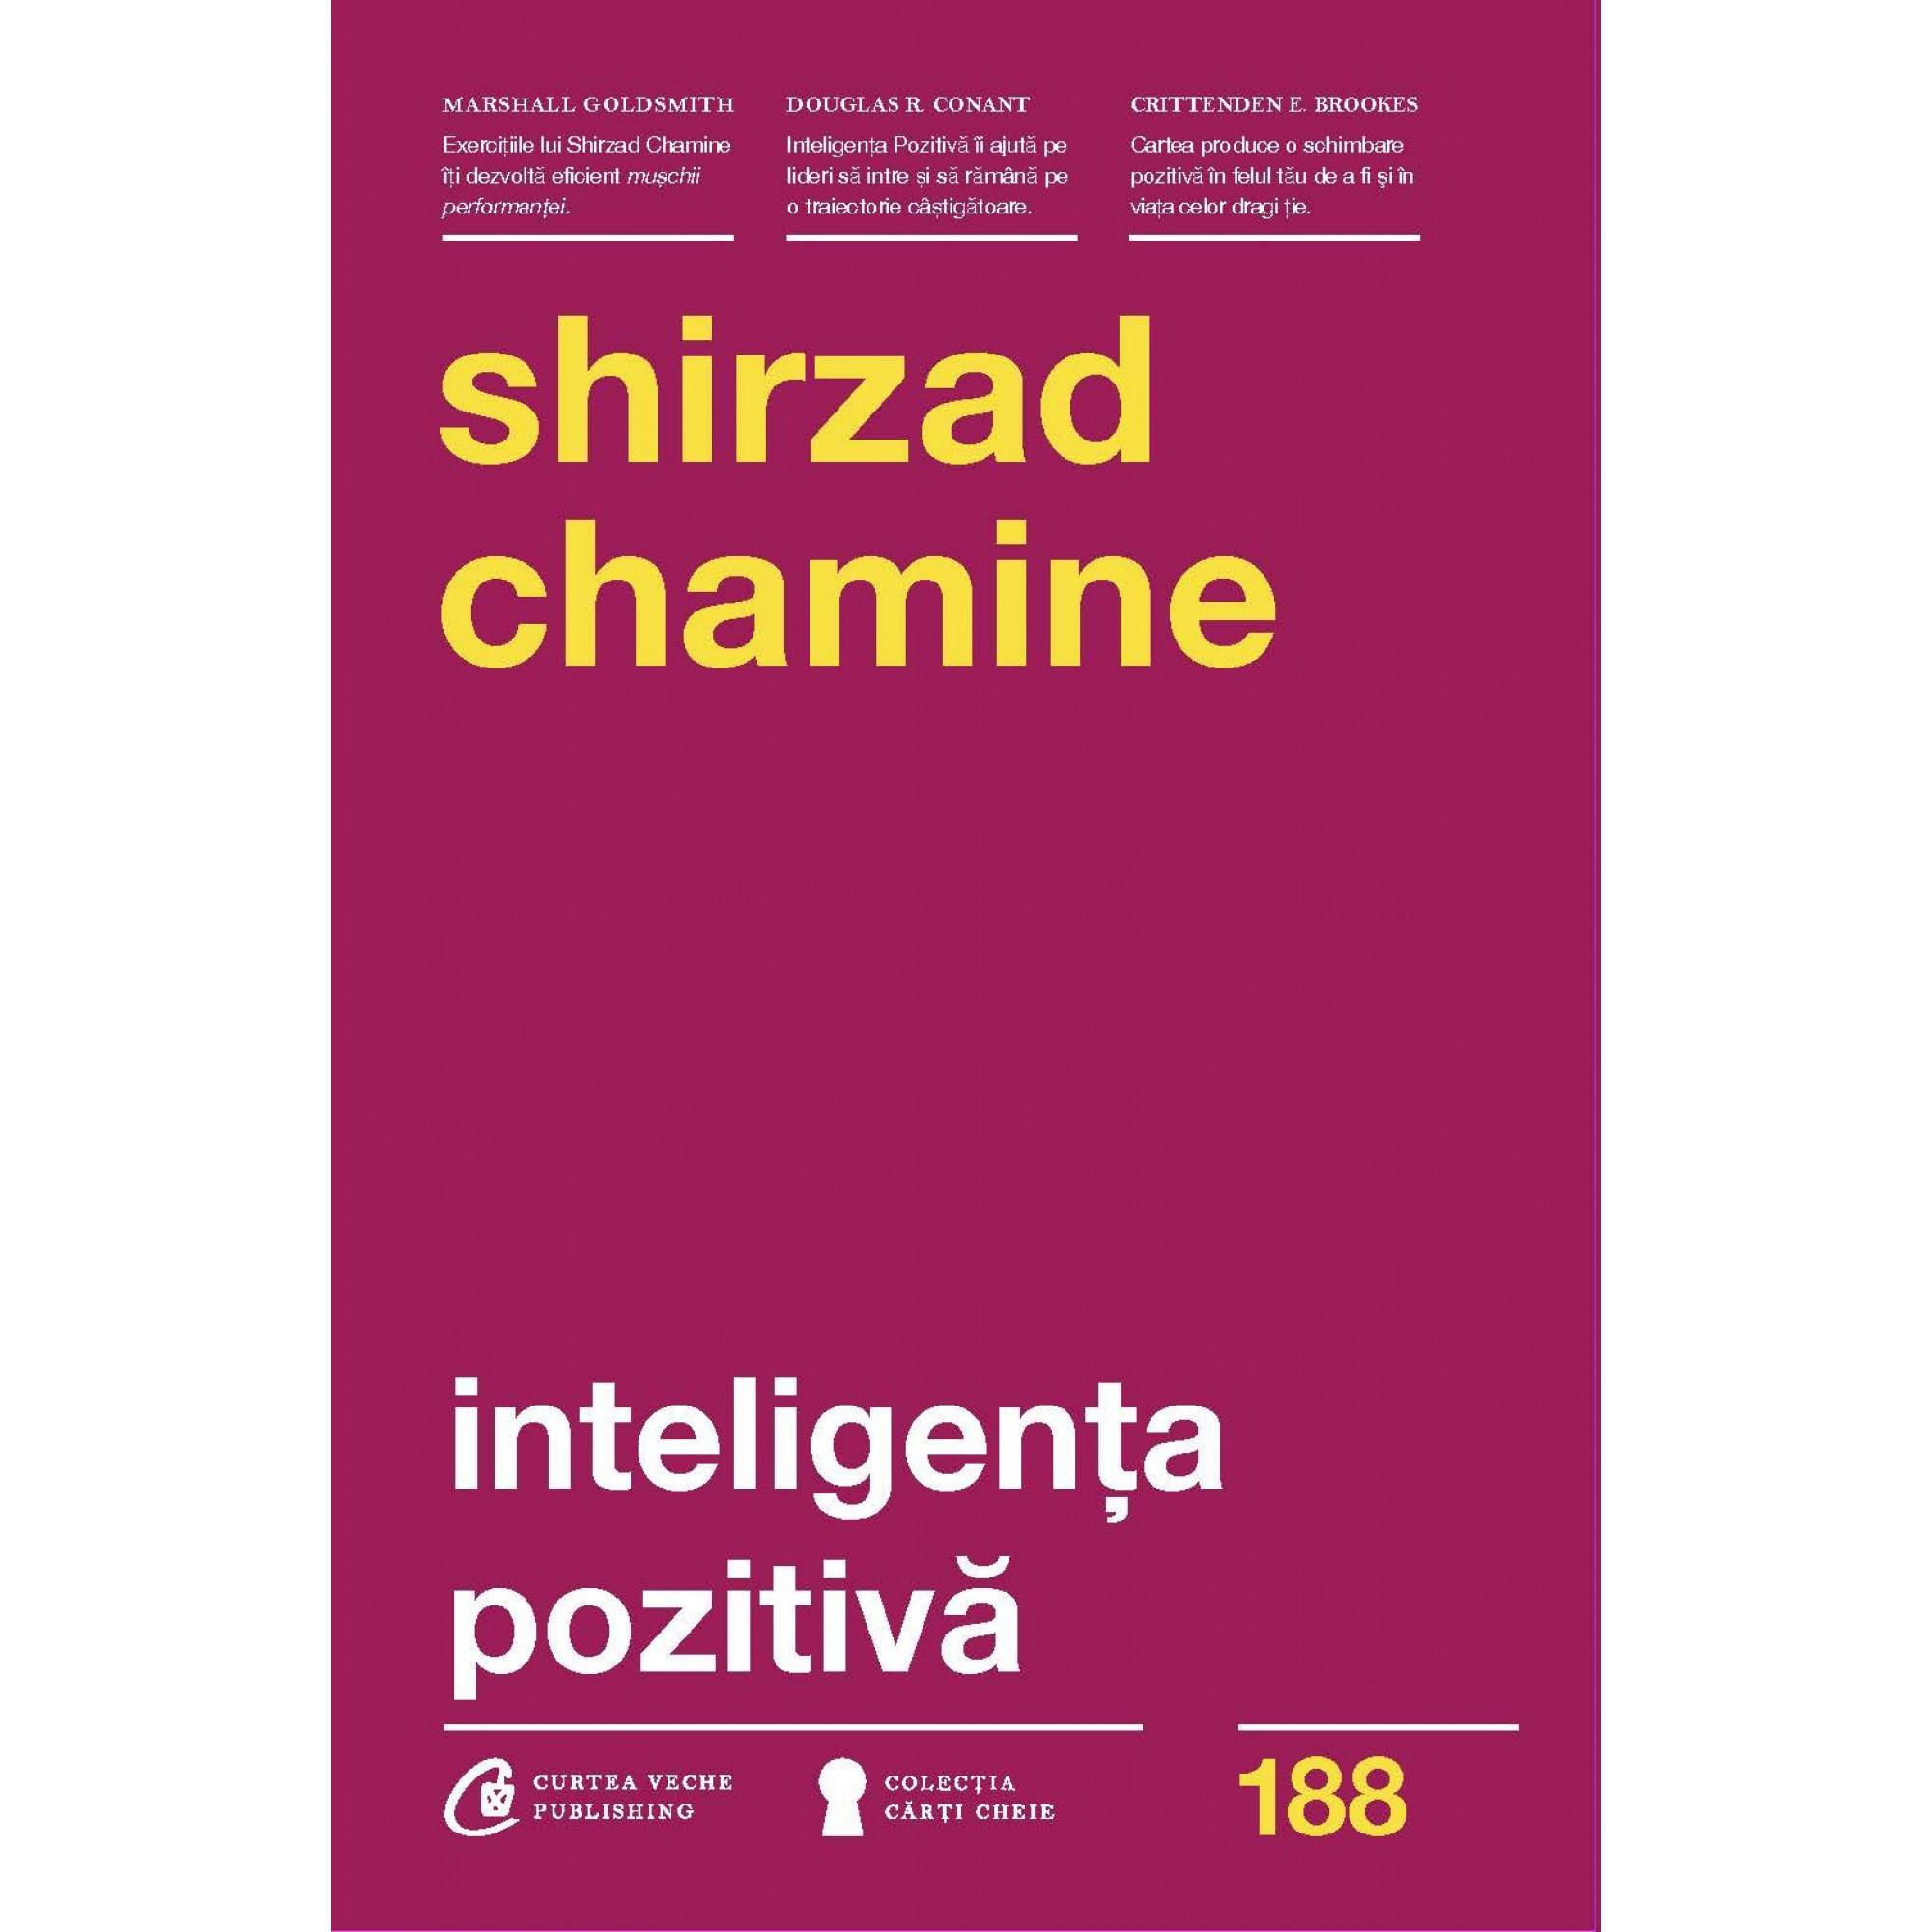 Inteligența pozitivă; Shirzad Chamine